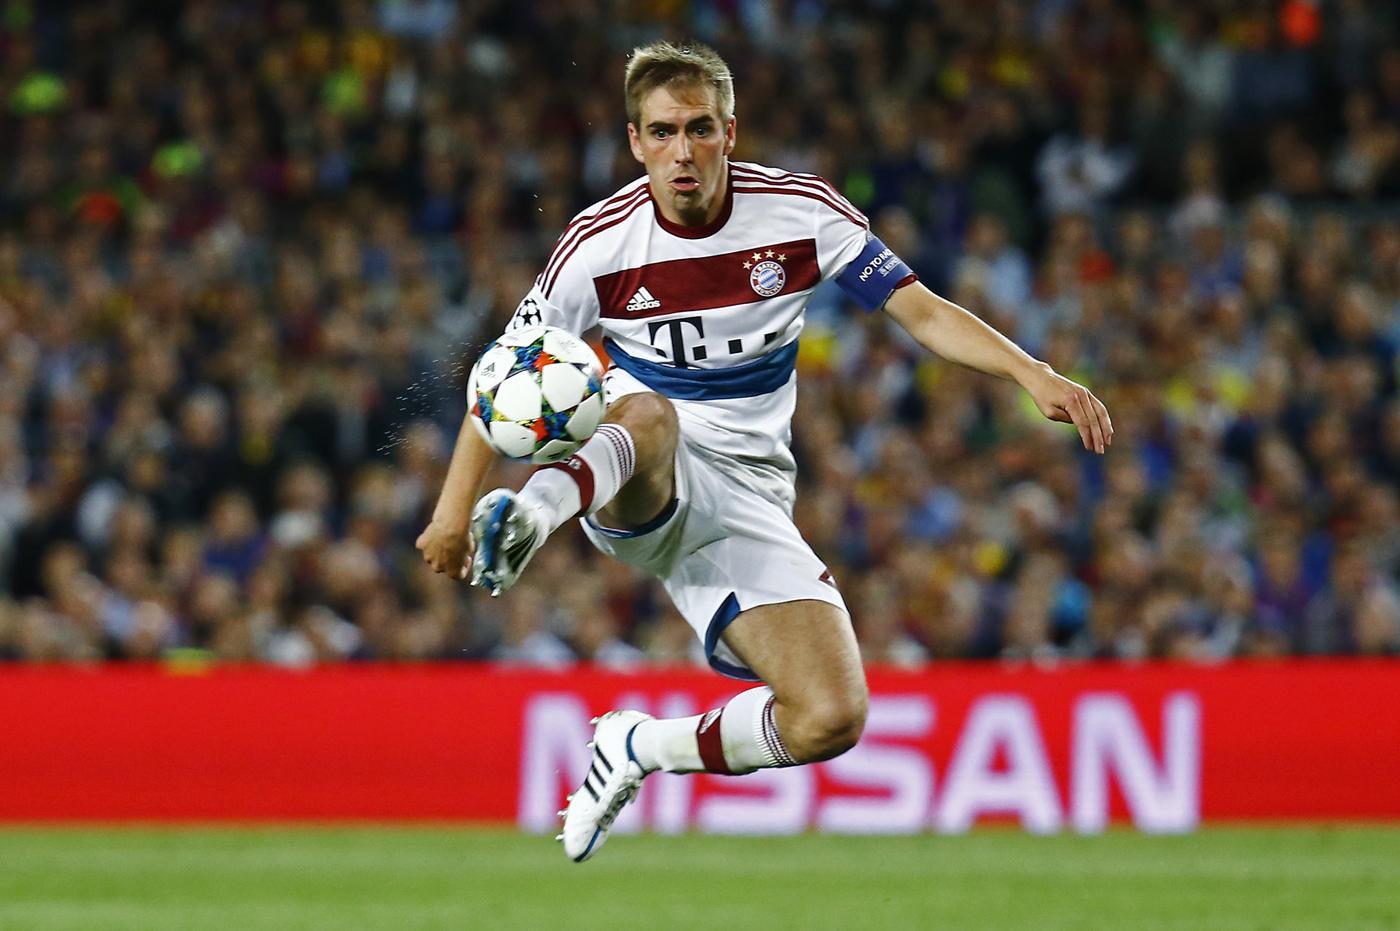 Bayern Munich star Philipp Lahm 'keen on Manchester United transfer'